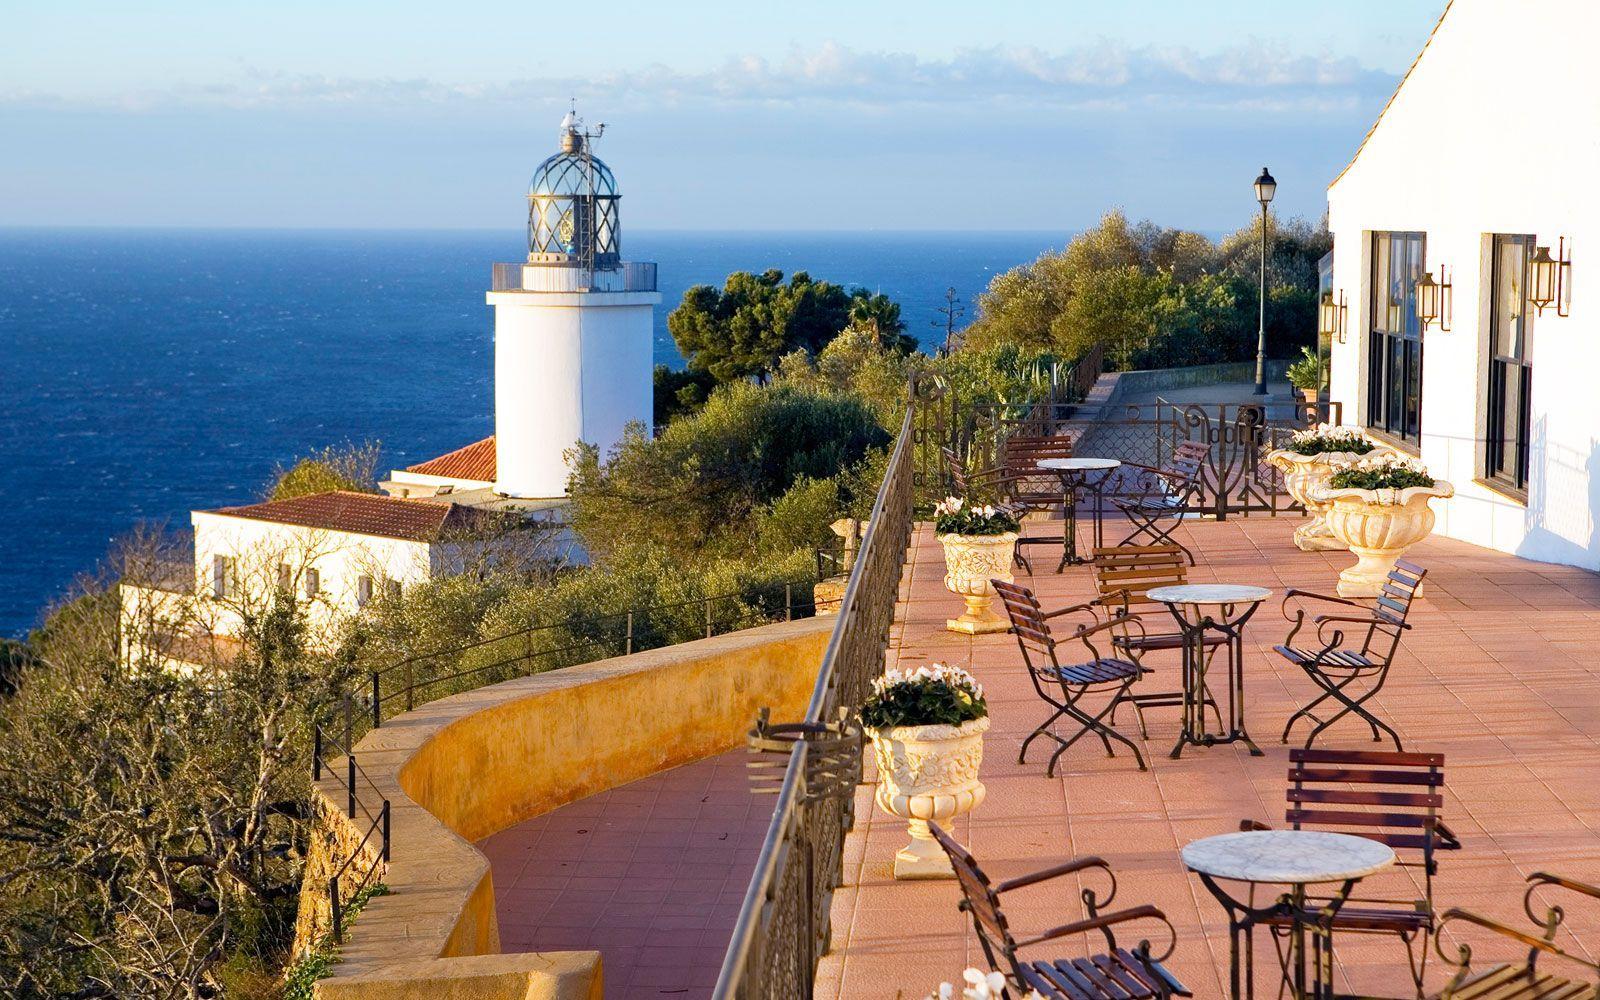 Terrasses amb vistes a Girona i la Costa Brava